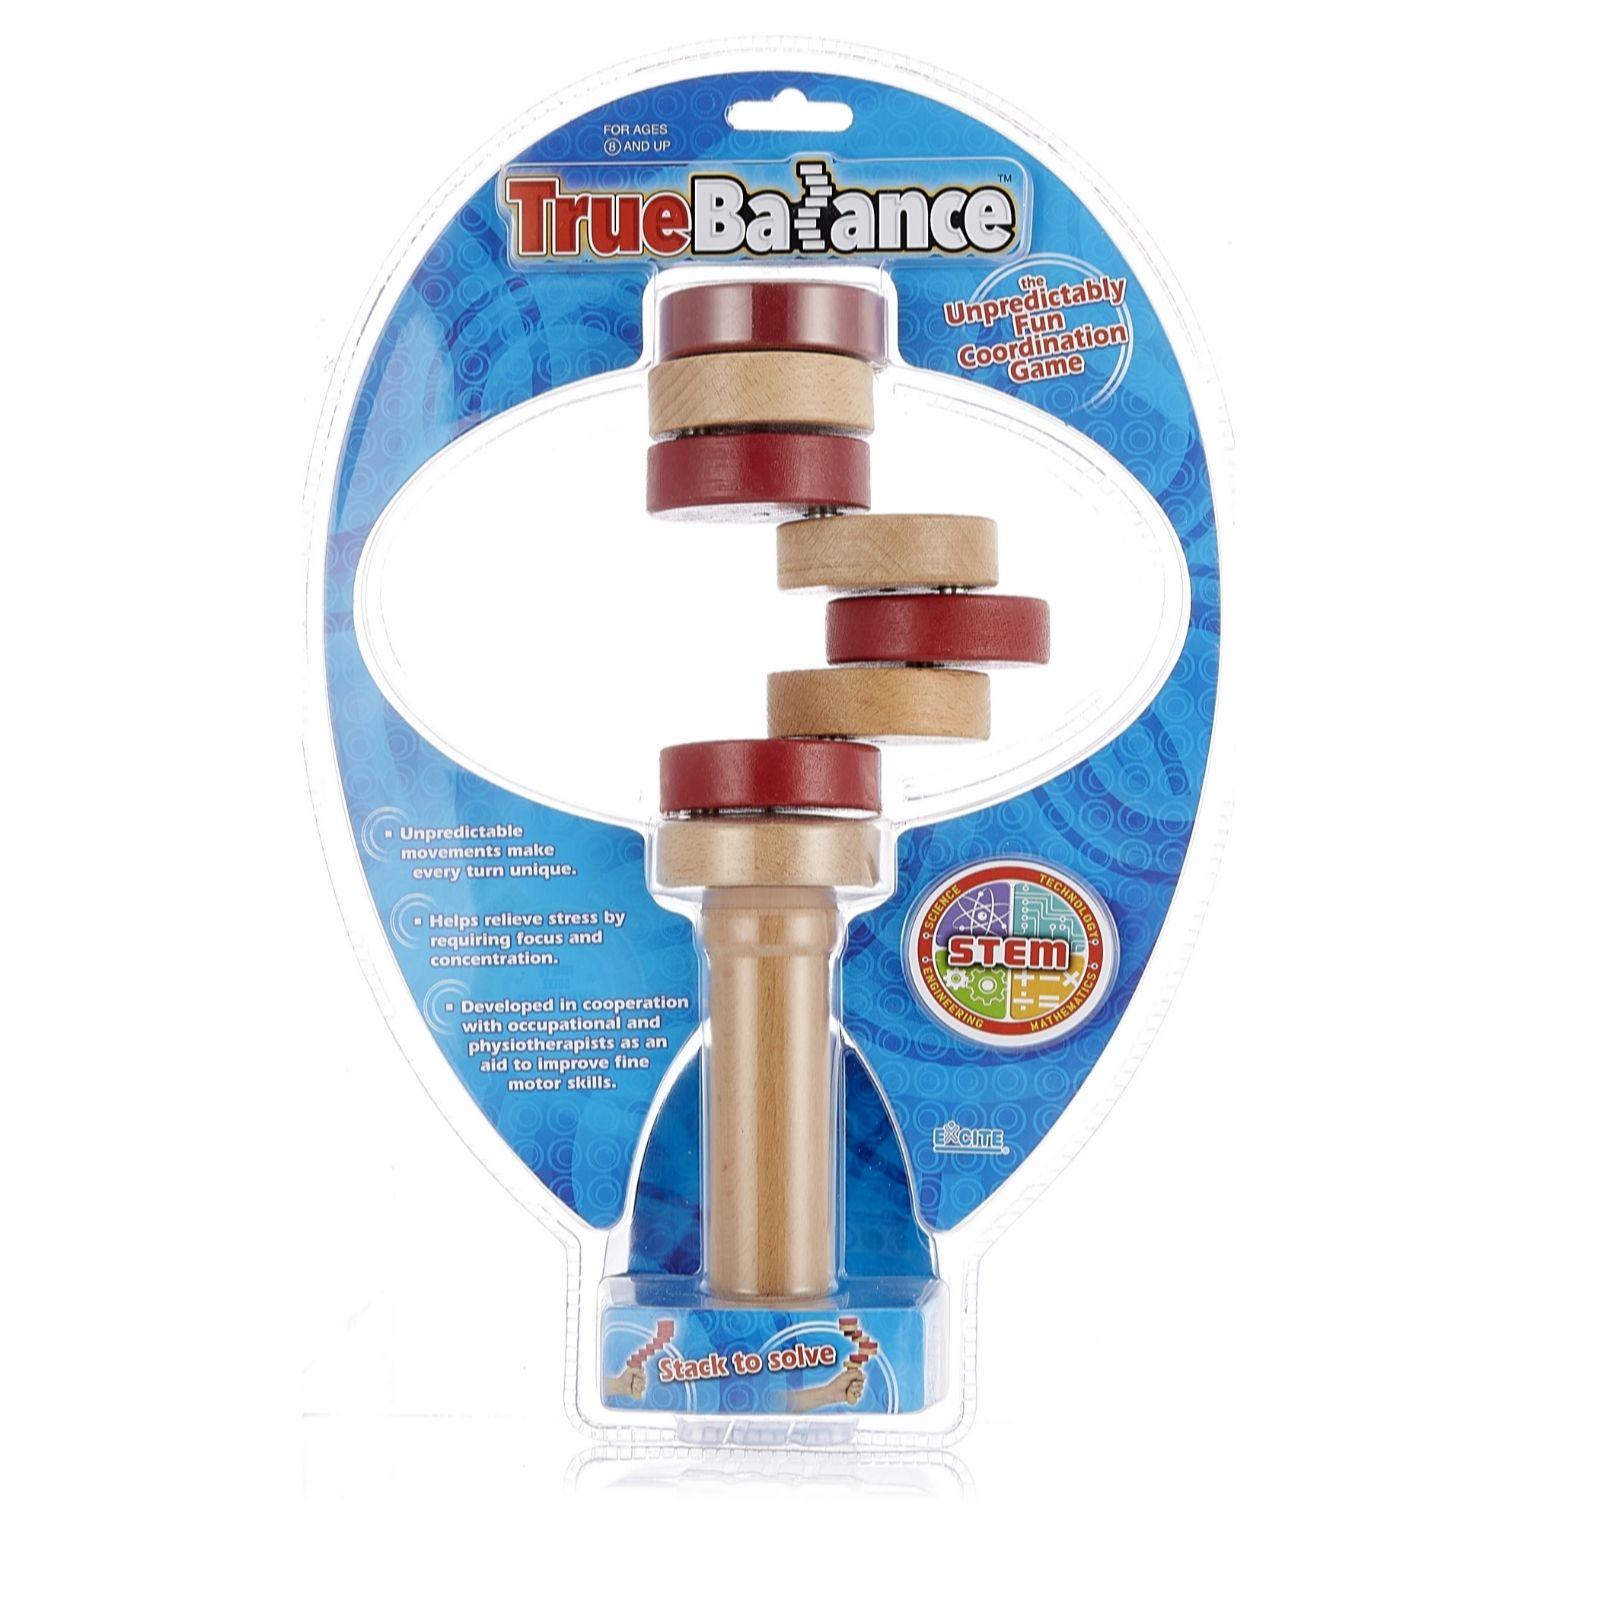 True Balance Wooden Handheld Balancer - QVC UK